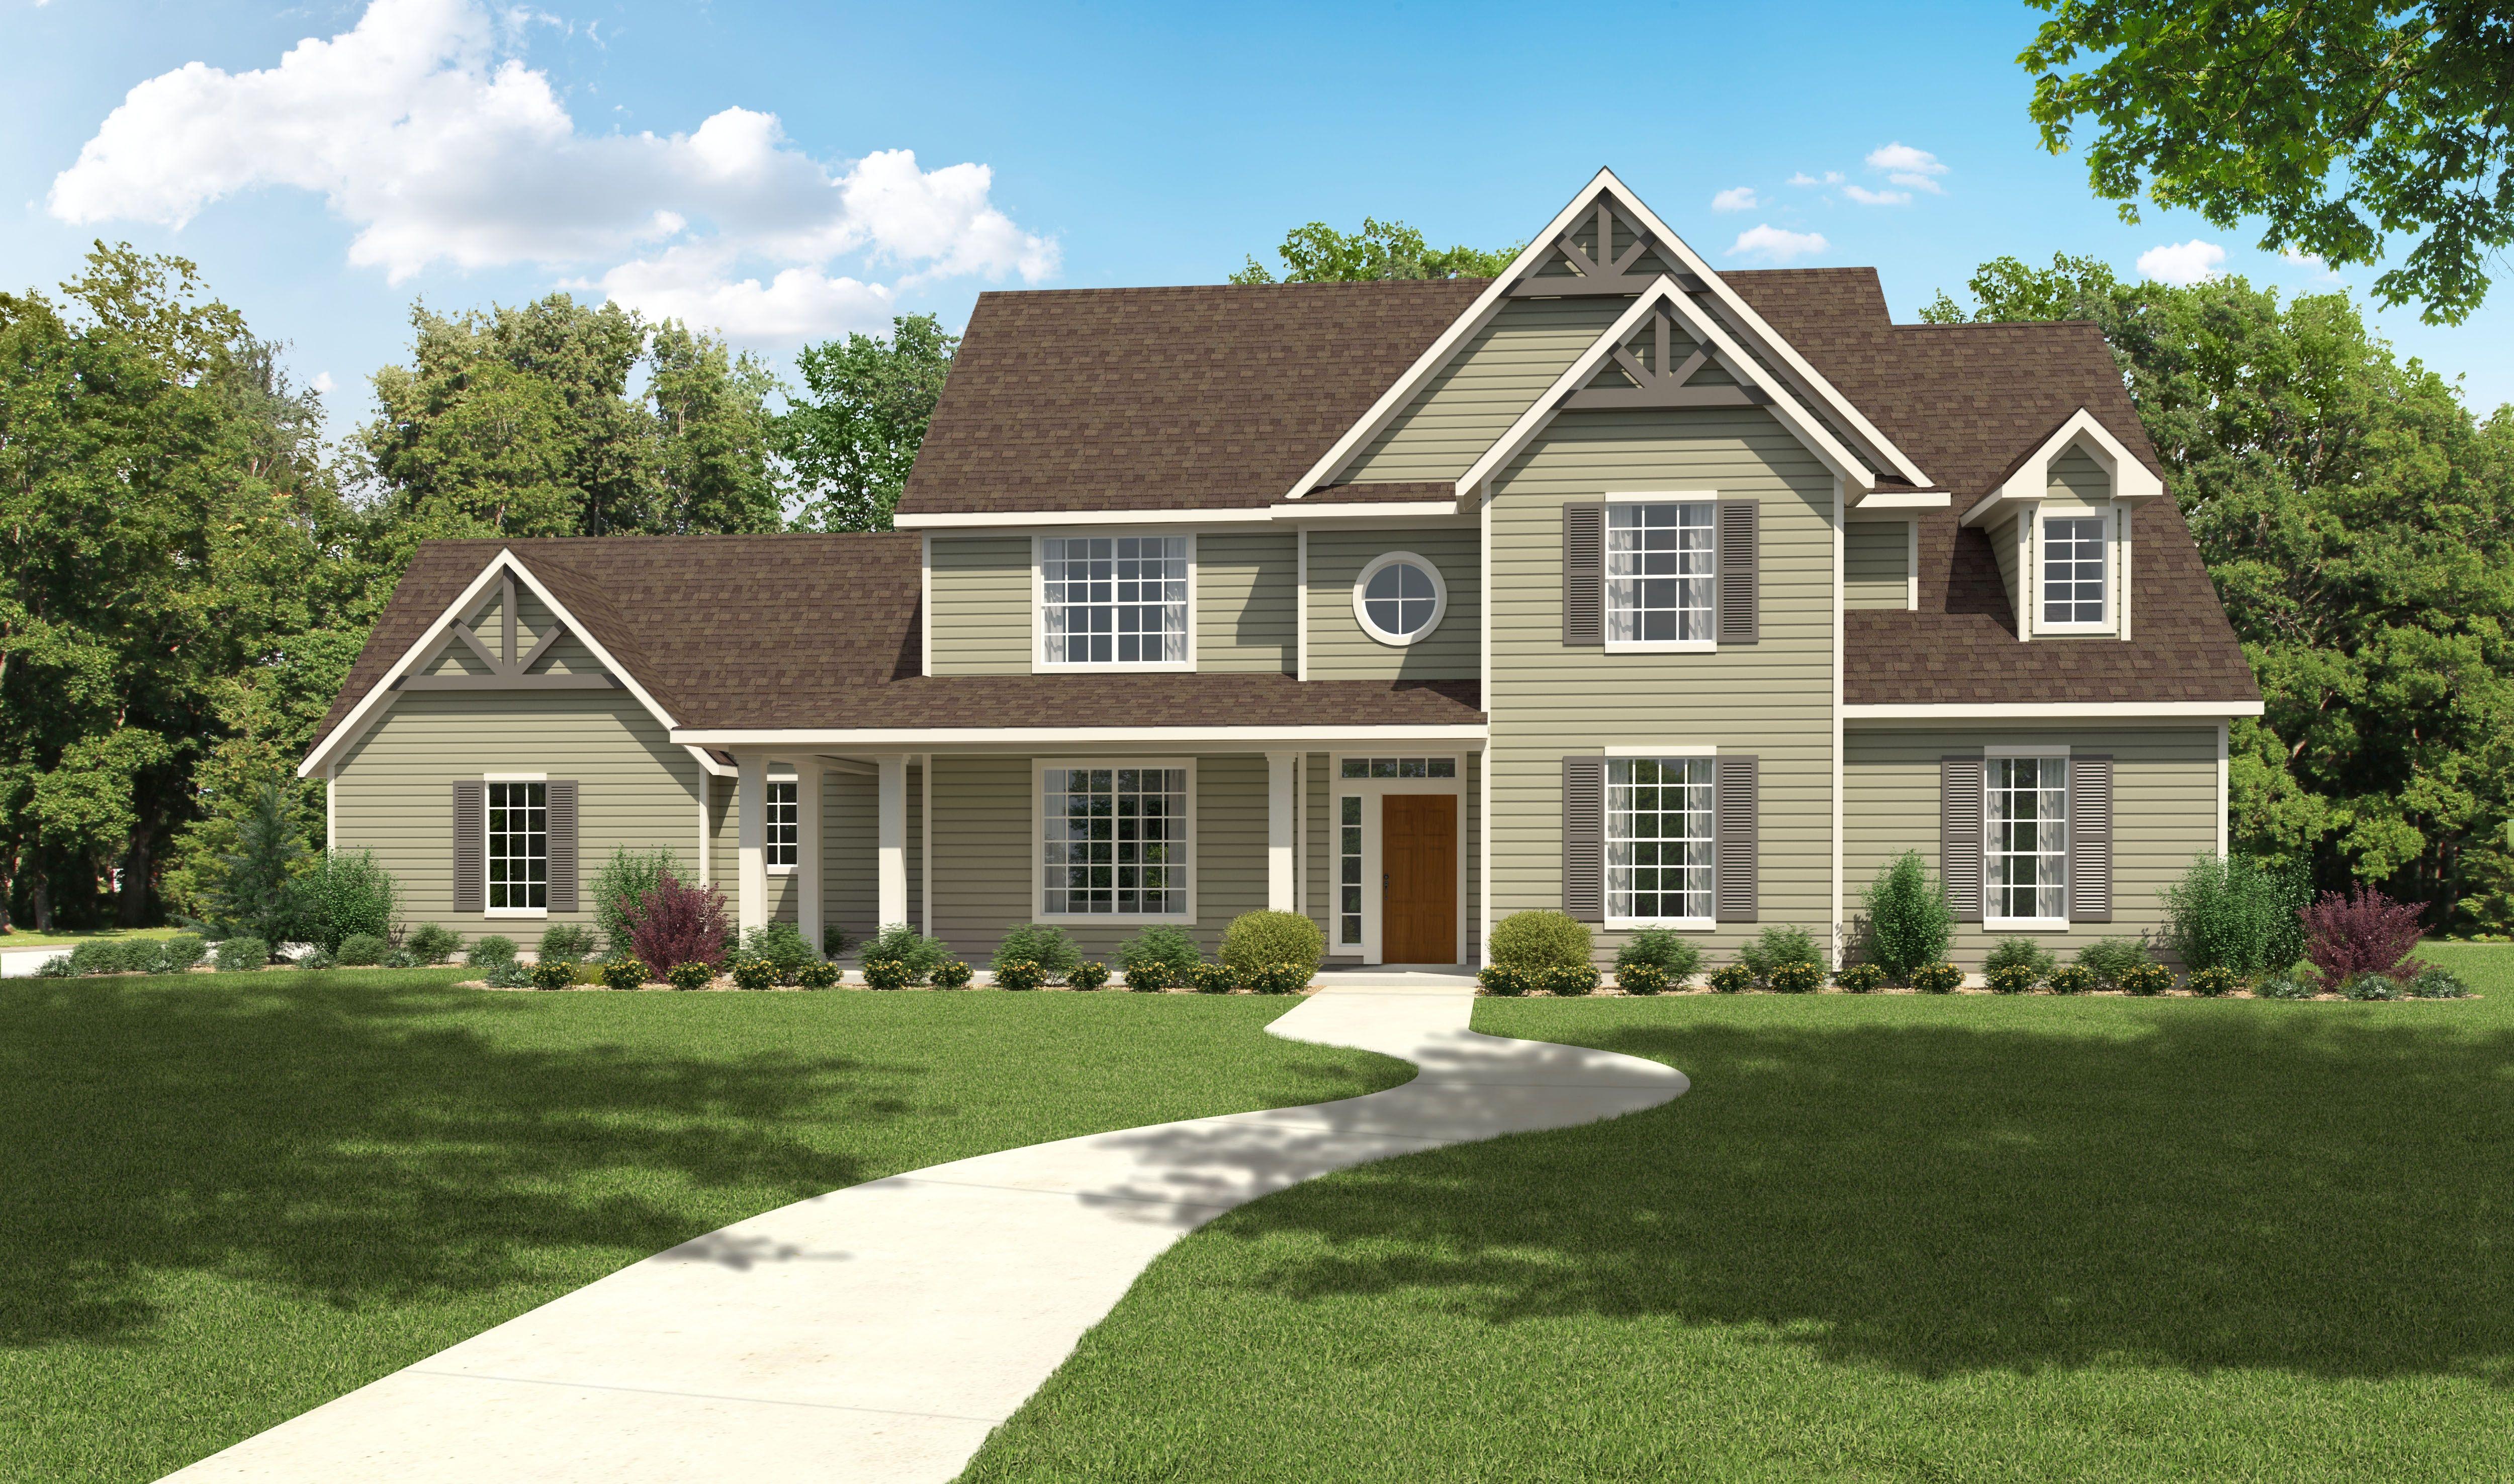 The Woodbridge 3000 Sq Ft House Plans Design Tech Homes